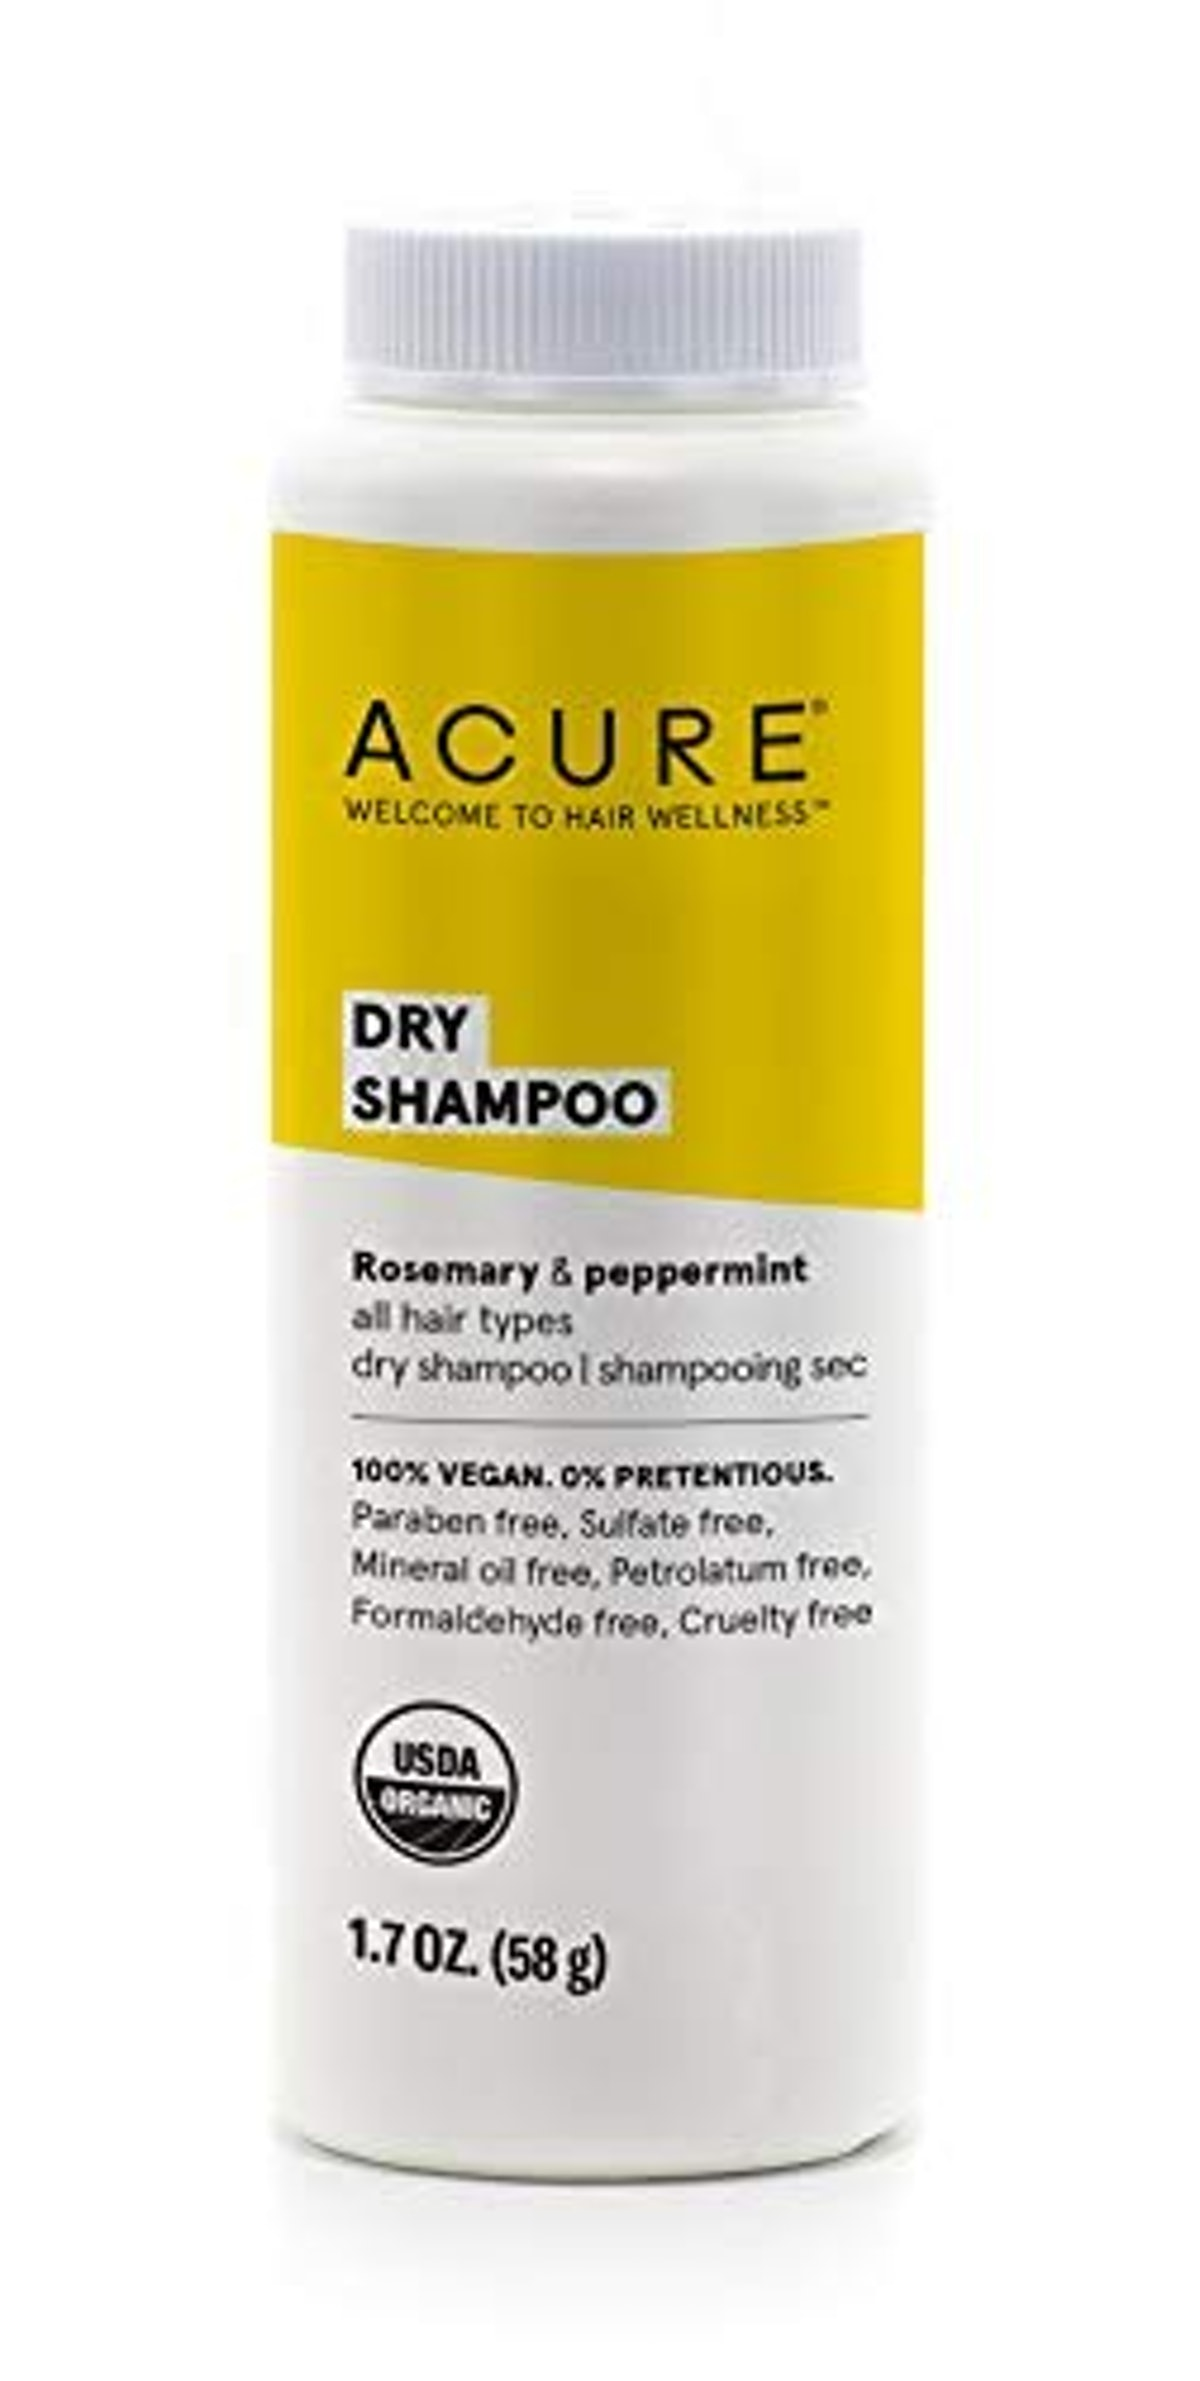 ACURE Dry Shampoo (1.7 Ounces)